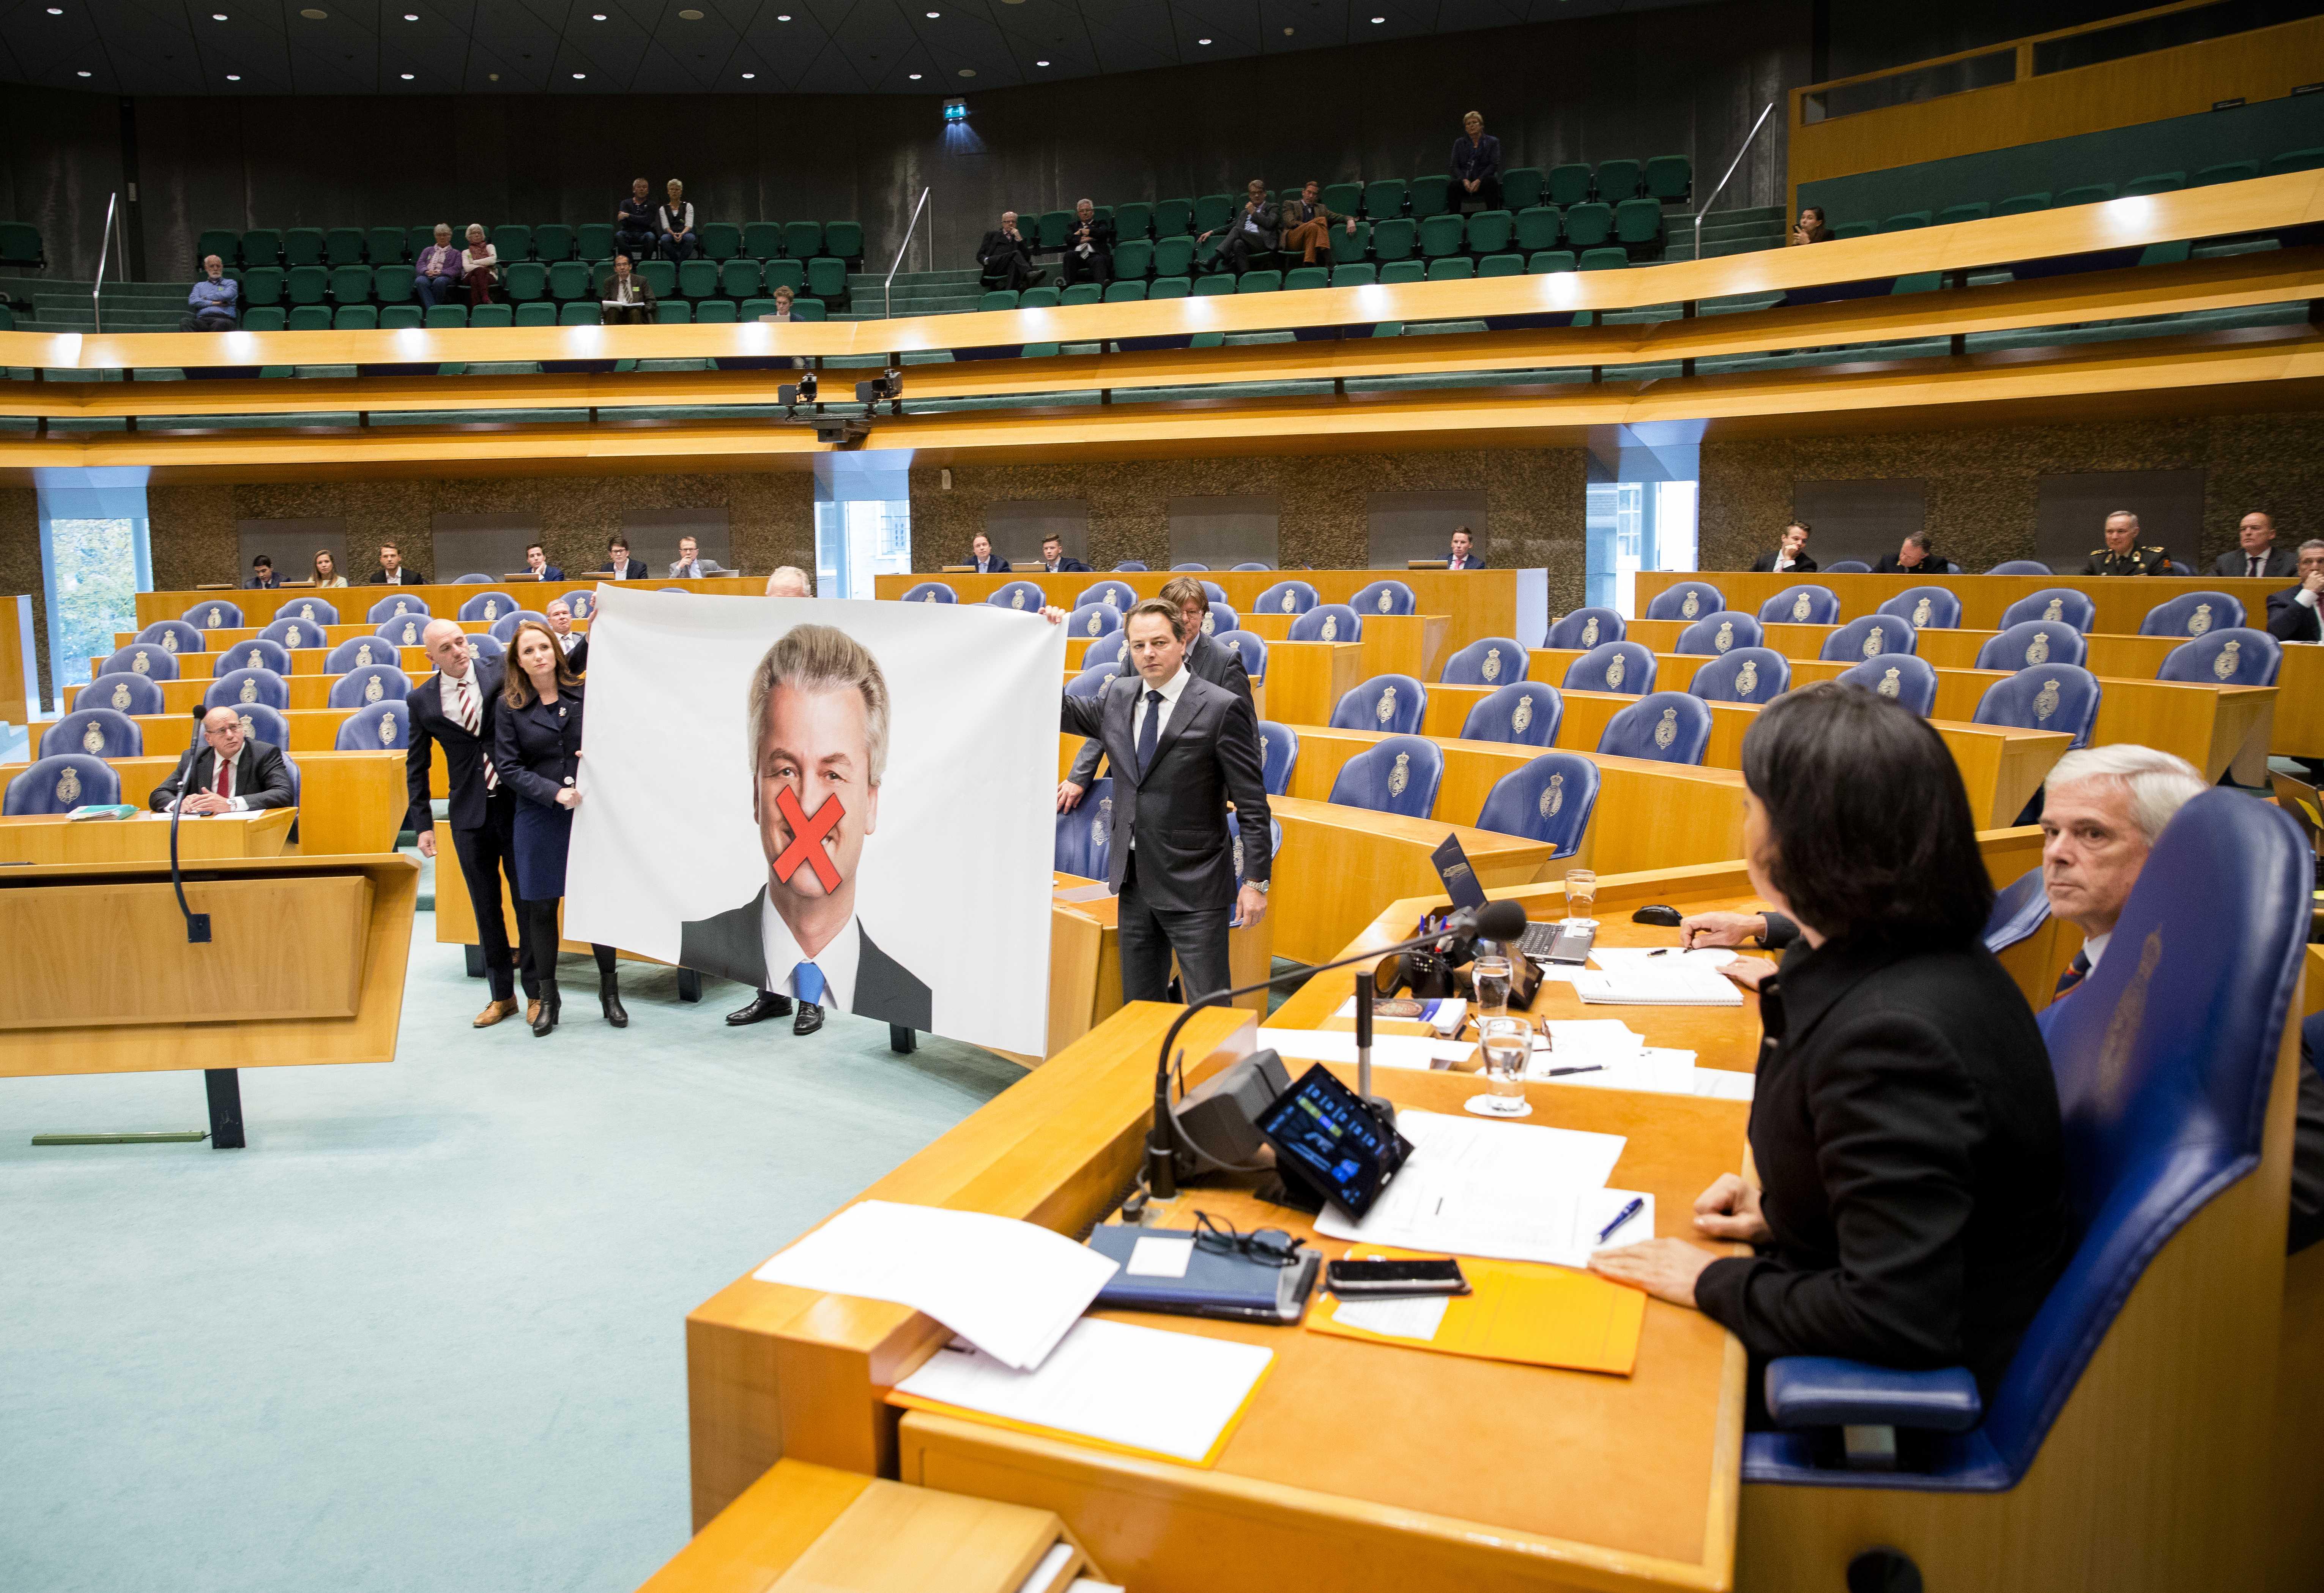 Протест в парламенте Нидерландов против антиевропейского депутата Герта Вилдерса. Фото: EPA